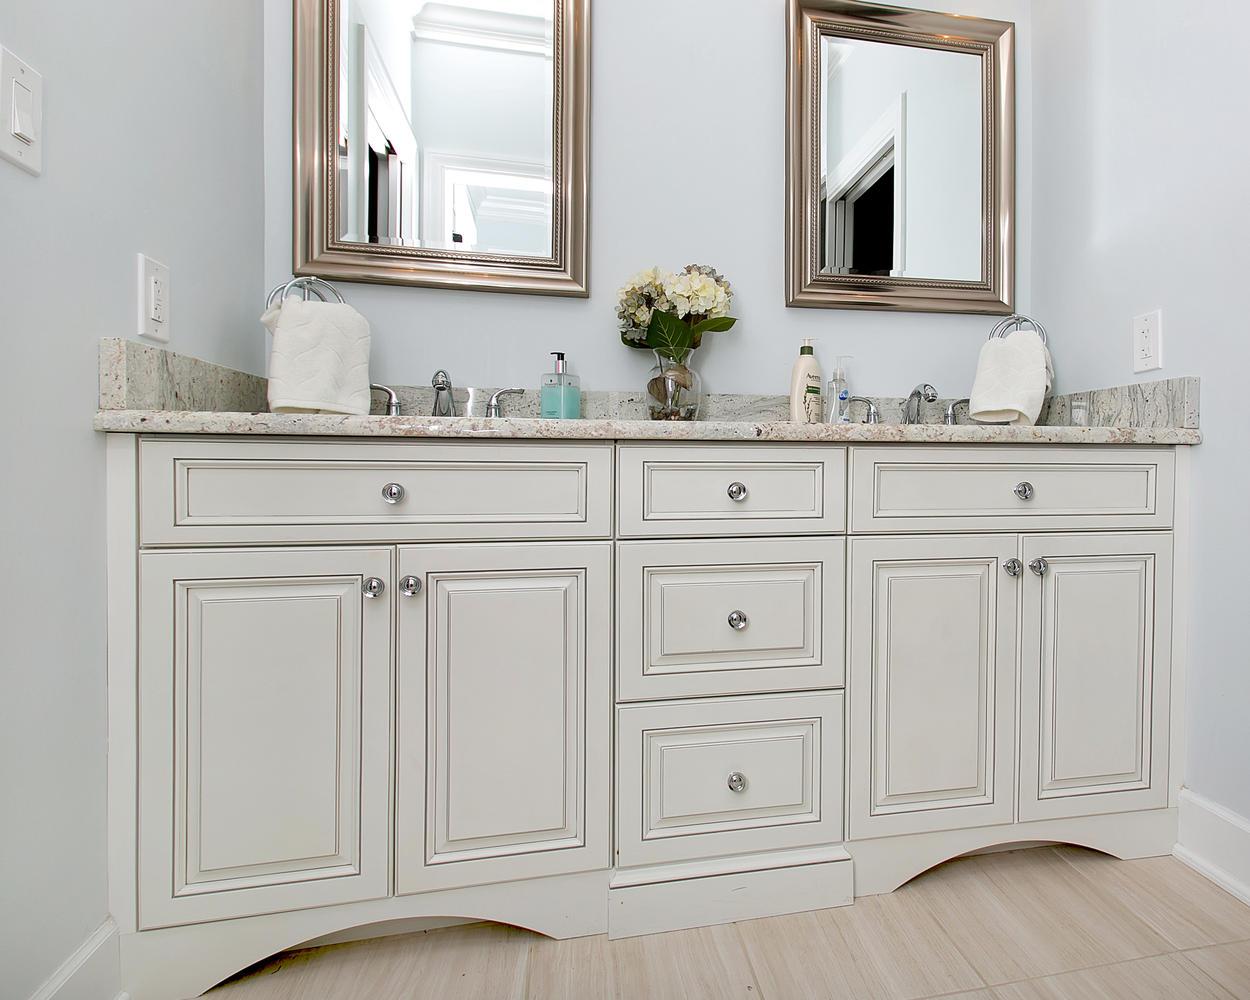 Custom Vanity  Bathroom Cabinetry  Design Line Kitchens in Sea Girt NJ